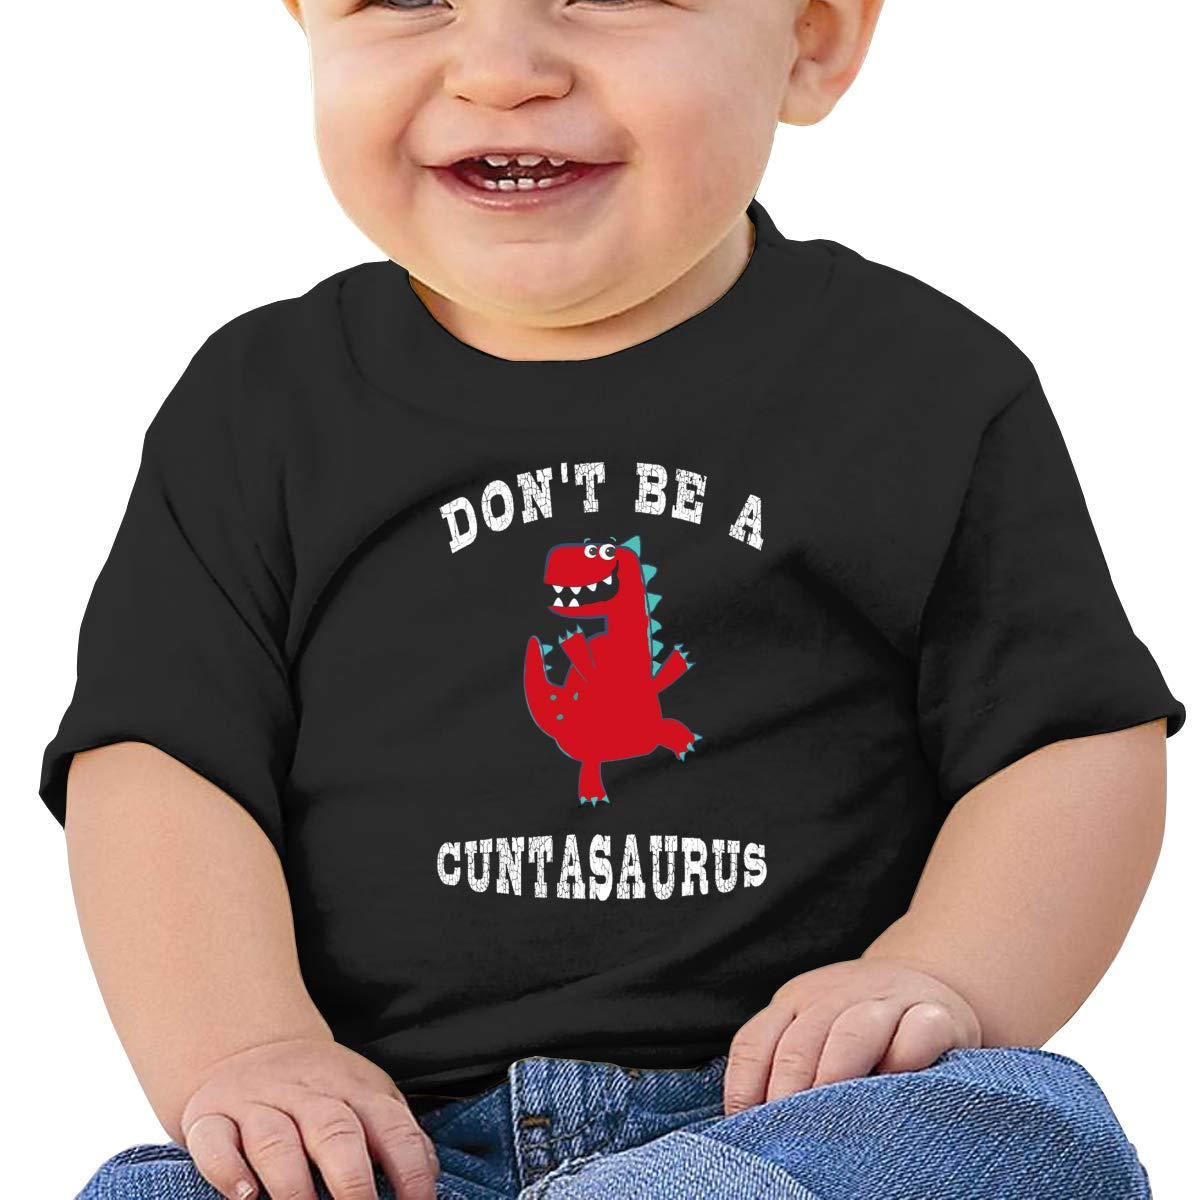 ShenigonDont Be A Cuntasaurus Toddler//Infant Short Sleeve Cotton T Shirts Black 47